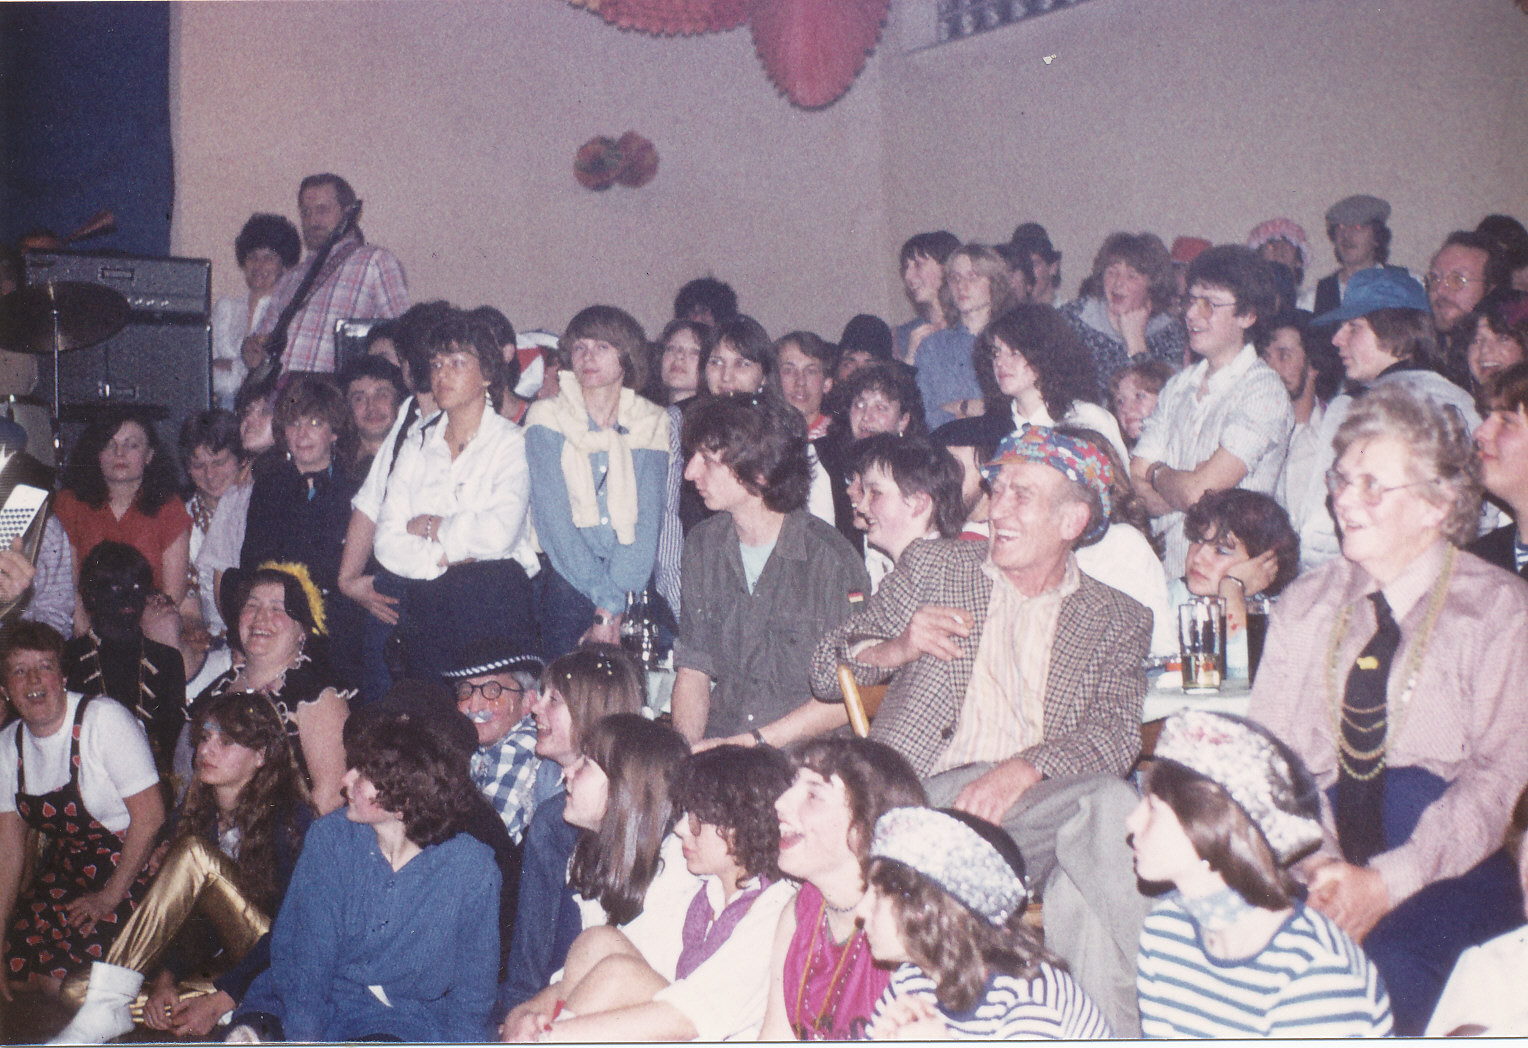 Närrische Singstunde 1982 mit Philipp Adam im Publikum